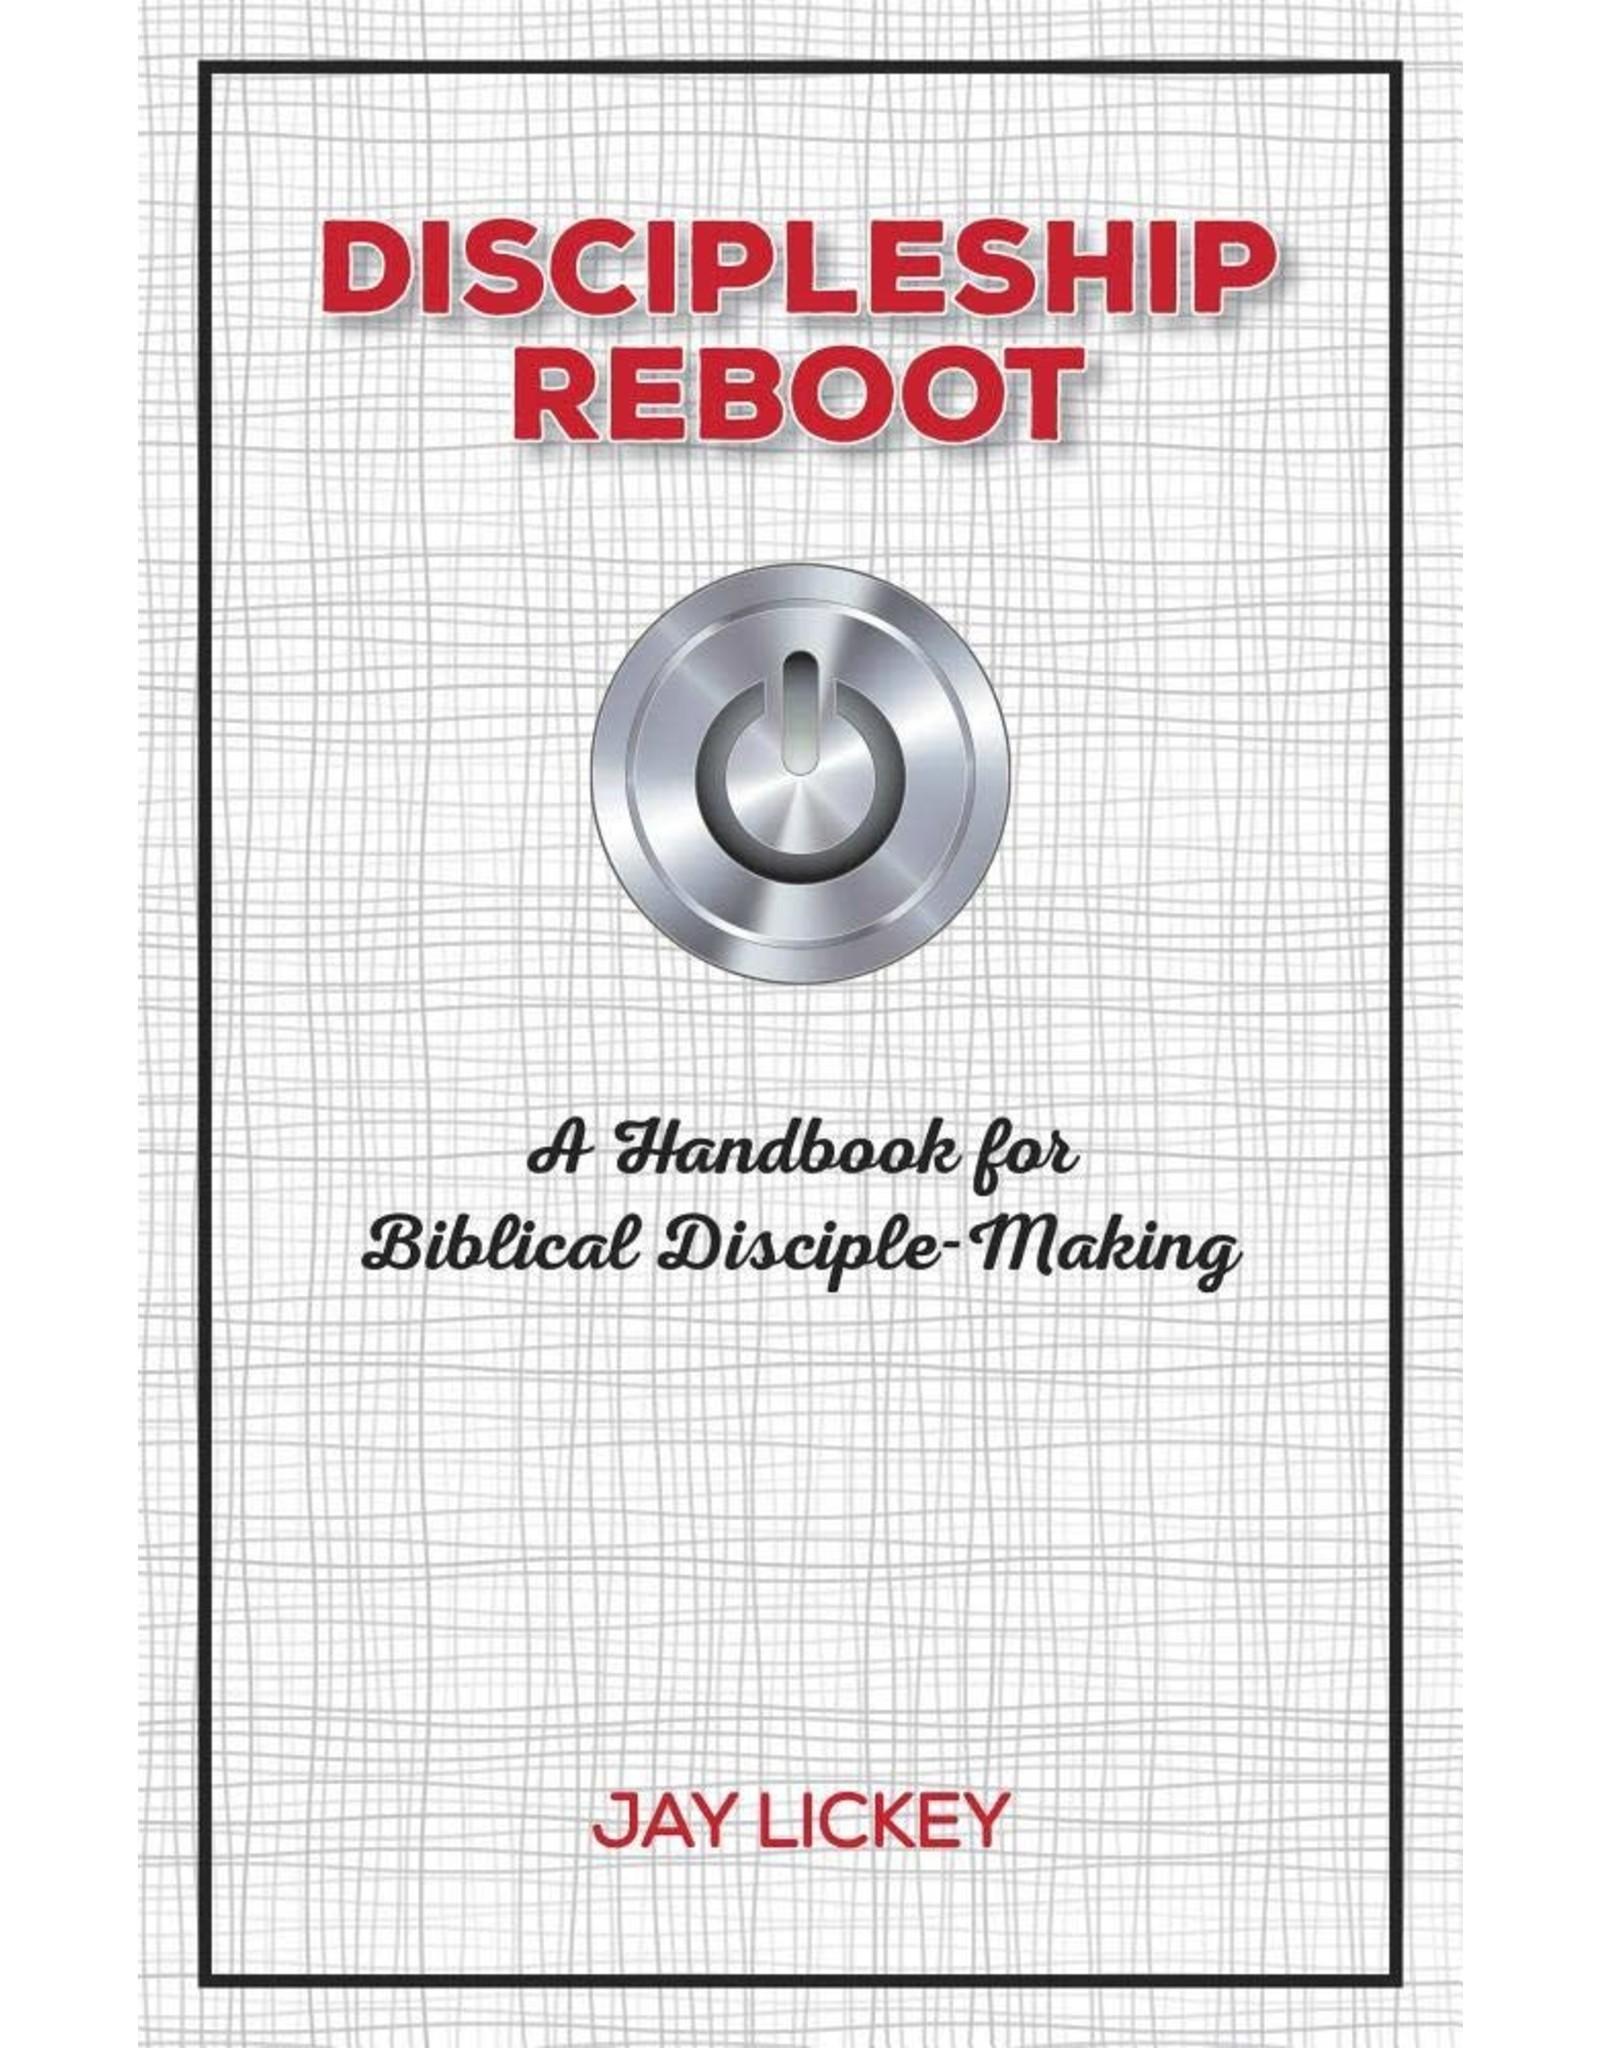 Focus Publishing Discipleship Reboot: A Handbook for Biblical Disciple-Making